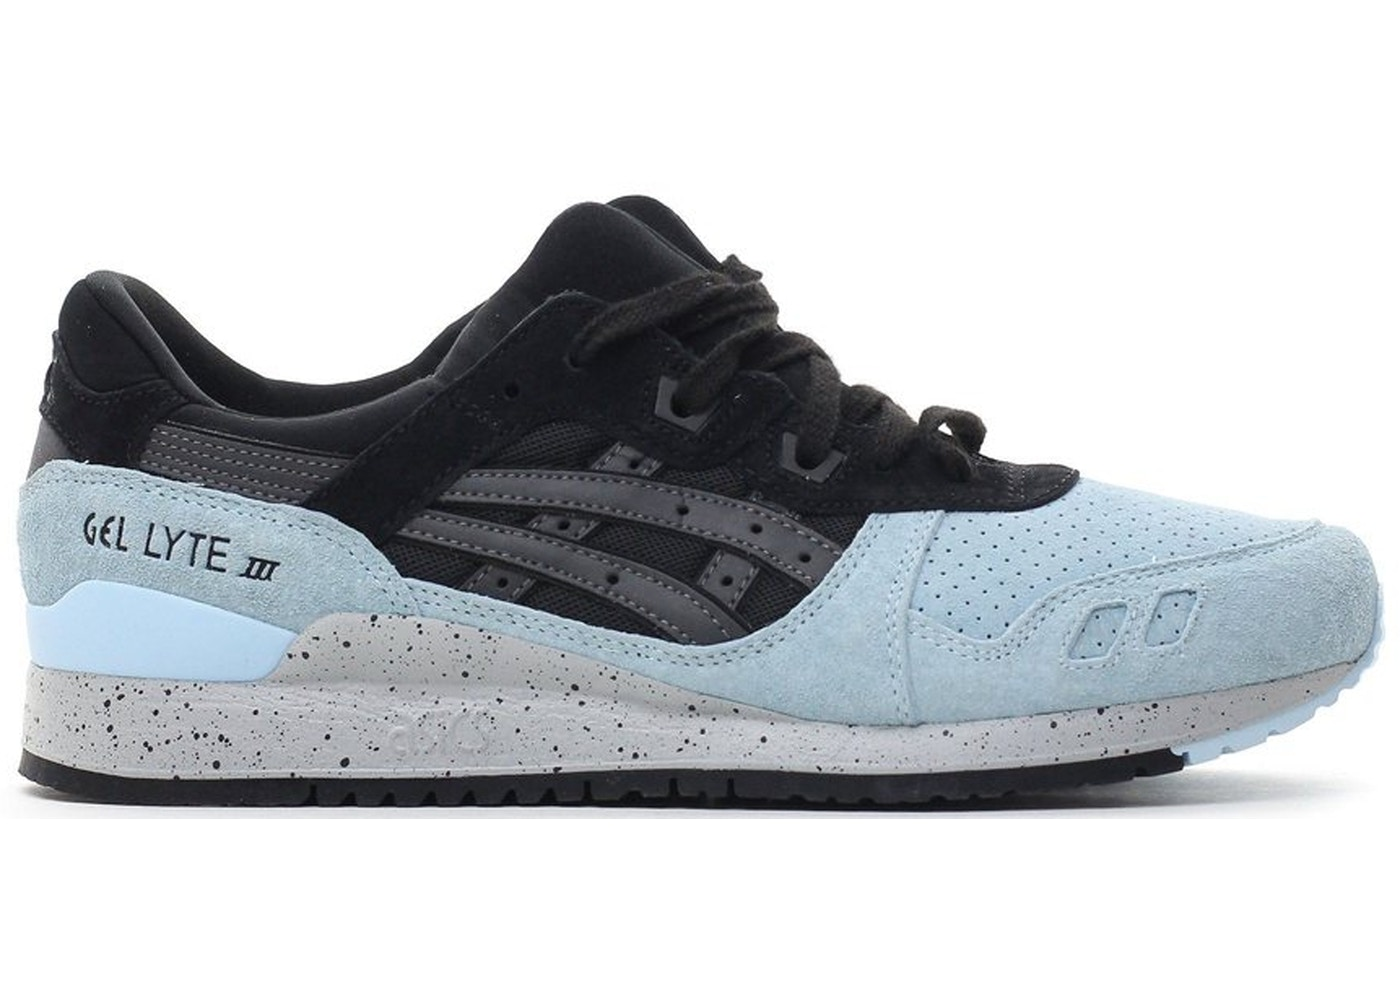 discount 754bd 5a4c4 Asics Gel-Lyte III Black Light Blue Speckle Grey